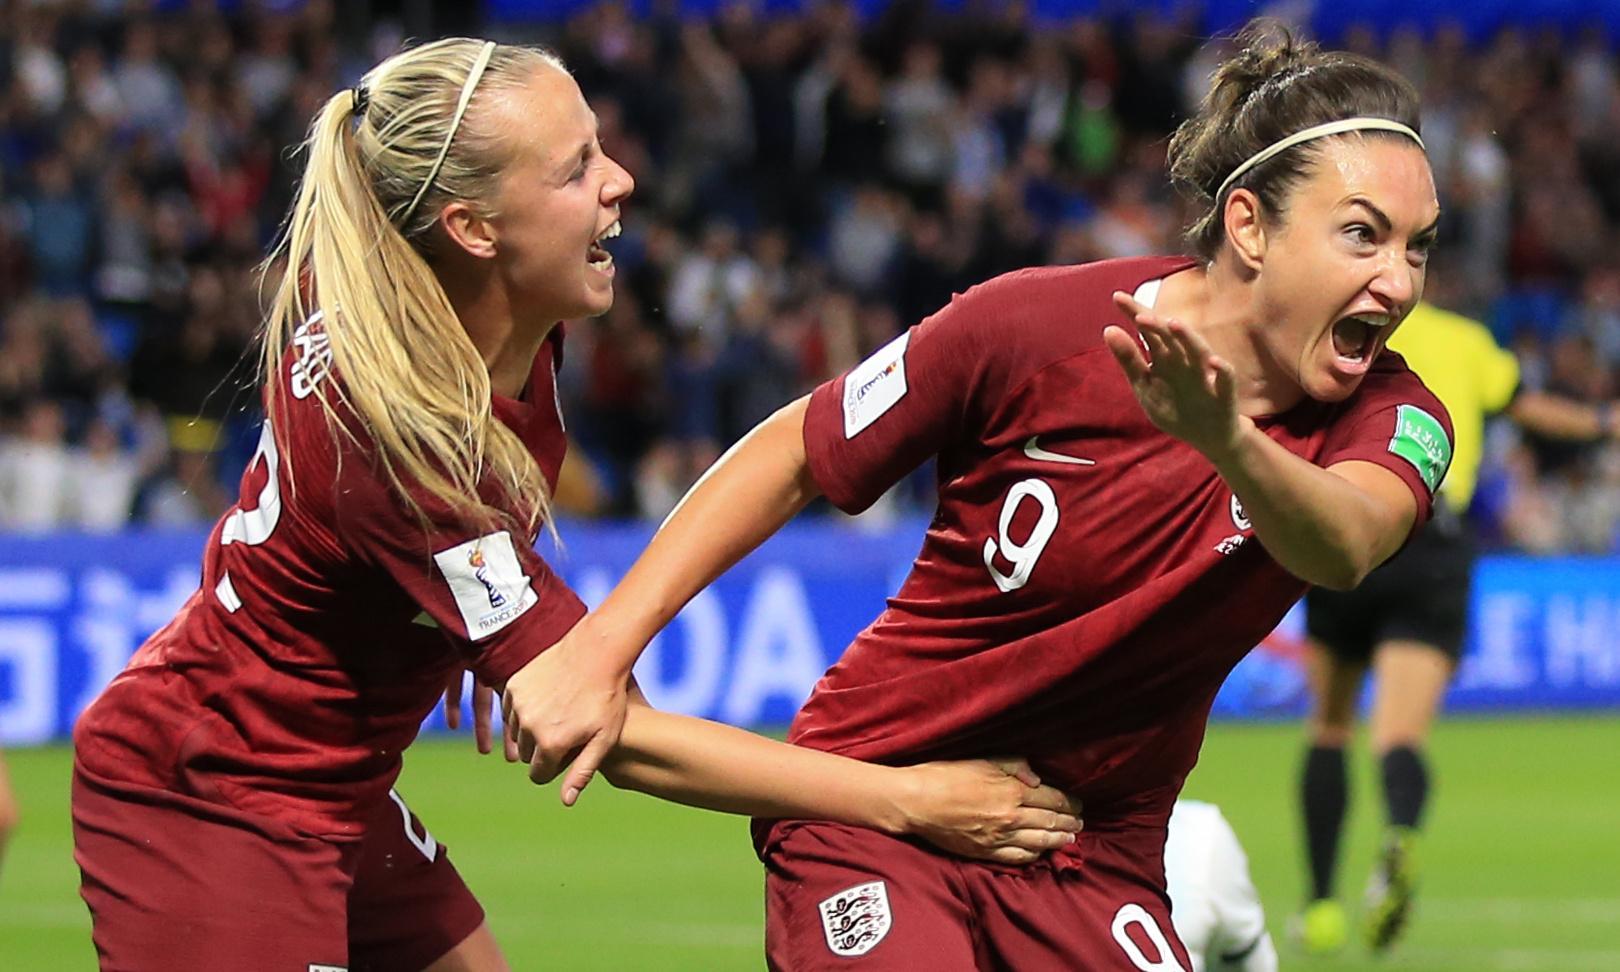 Jodie Taylor earns plaudits as England seek World Cup momentum